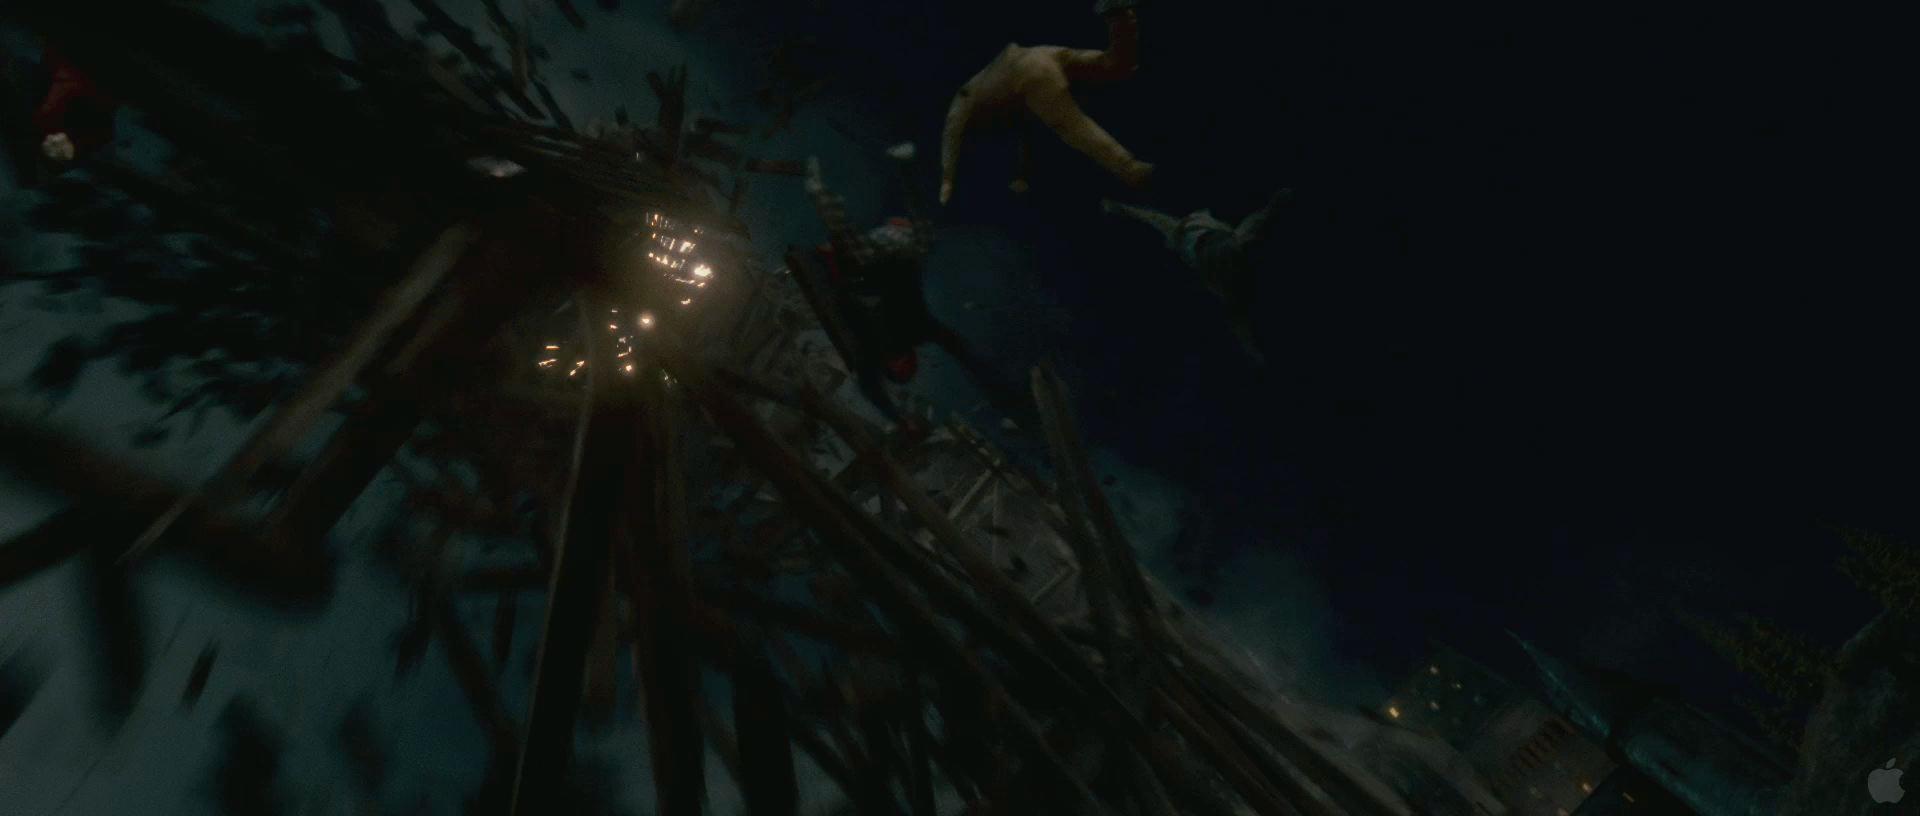 Harry Potter BlogHogwarts HP7 2 Trailer 76